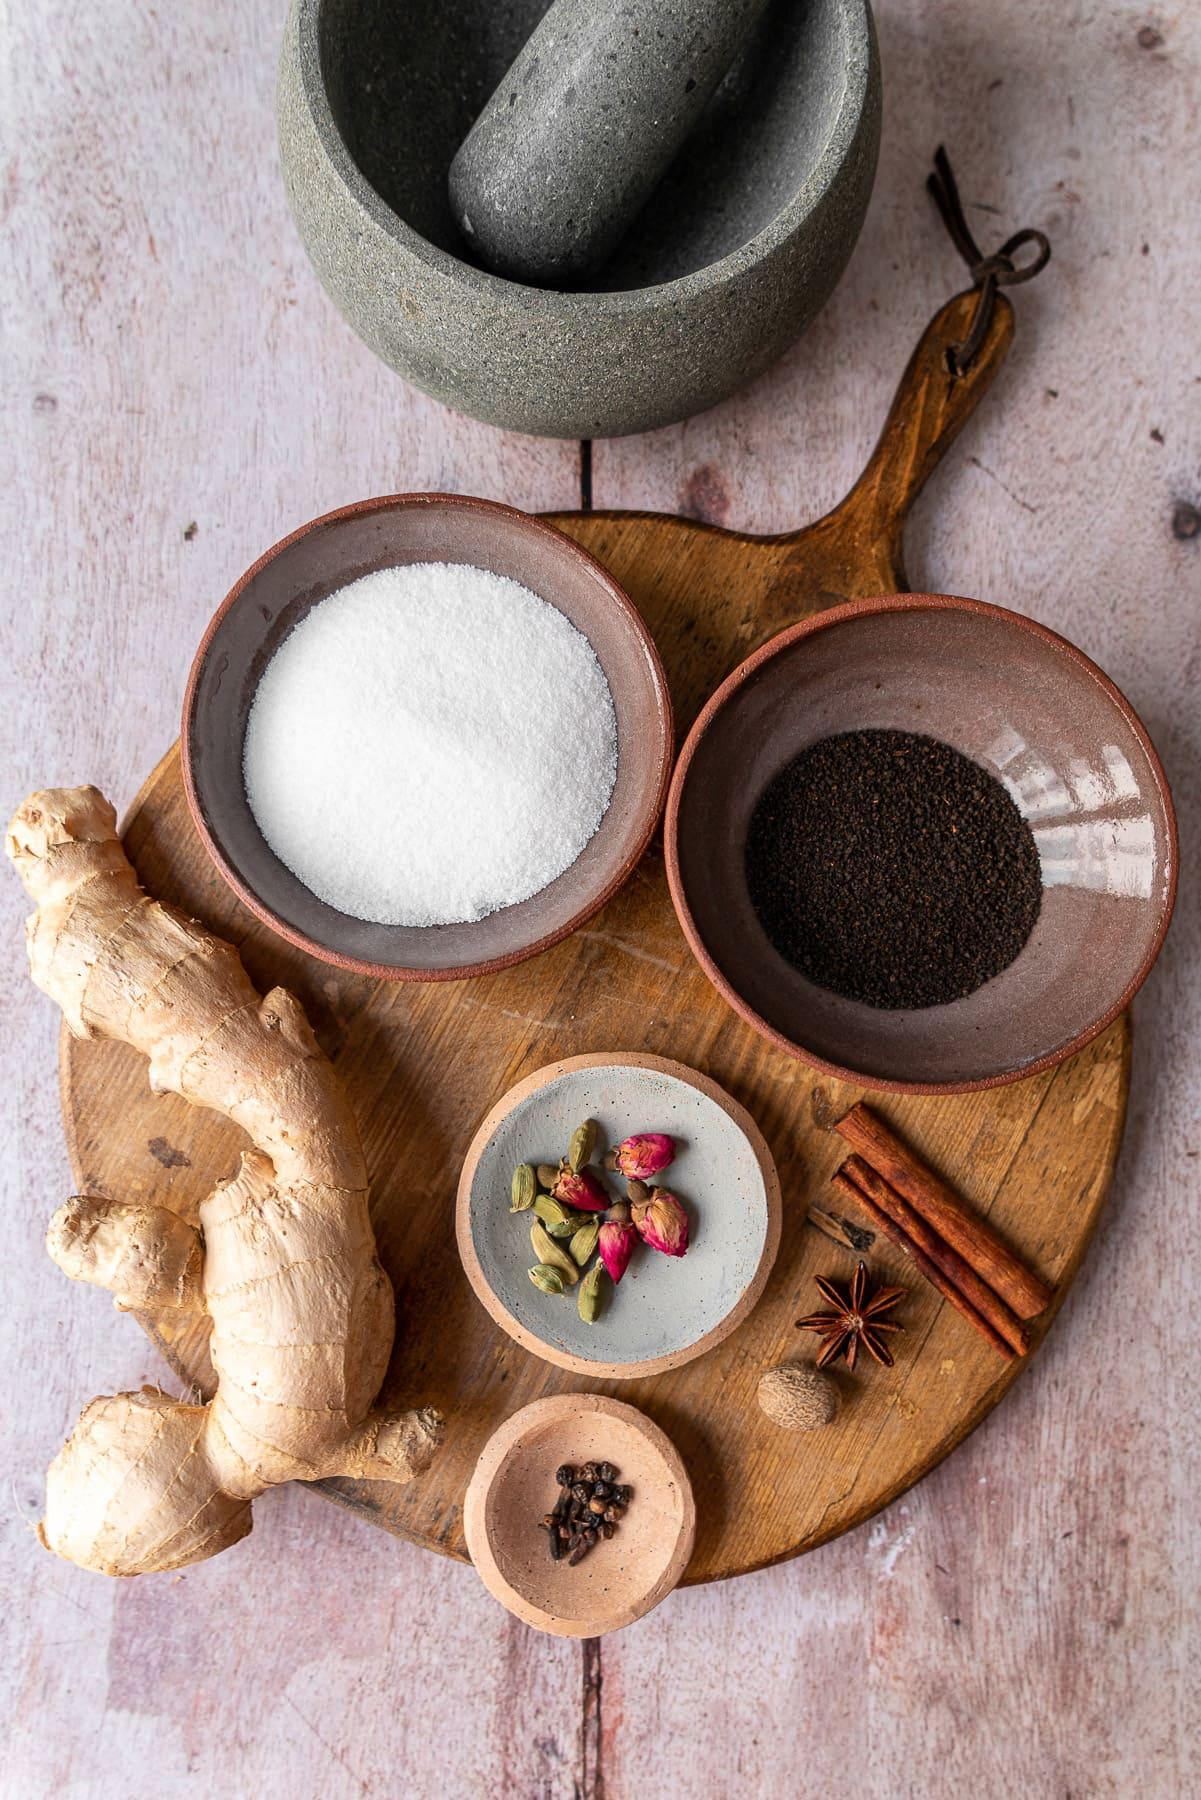 chai ingredients on a wooden bread board